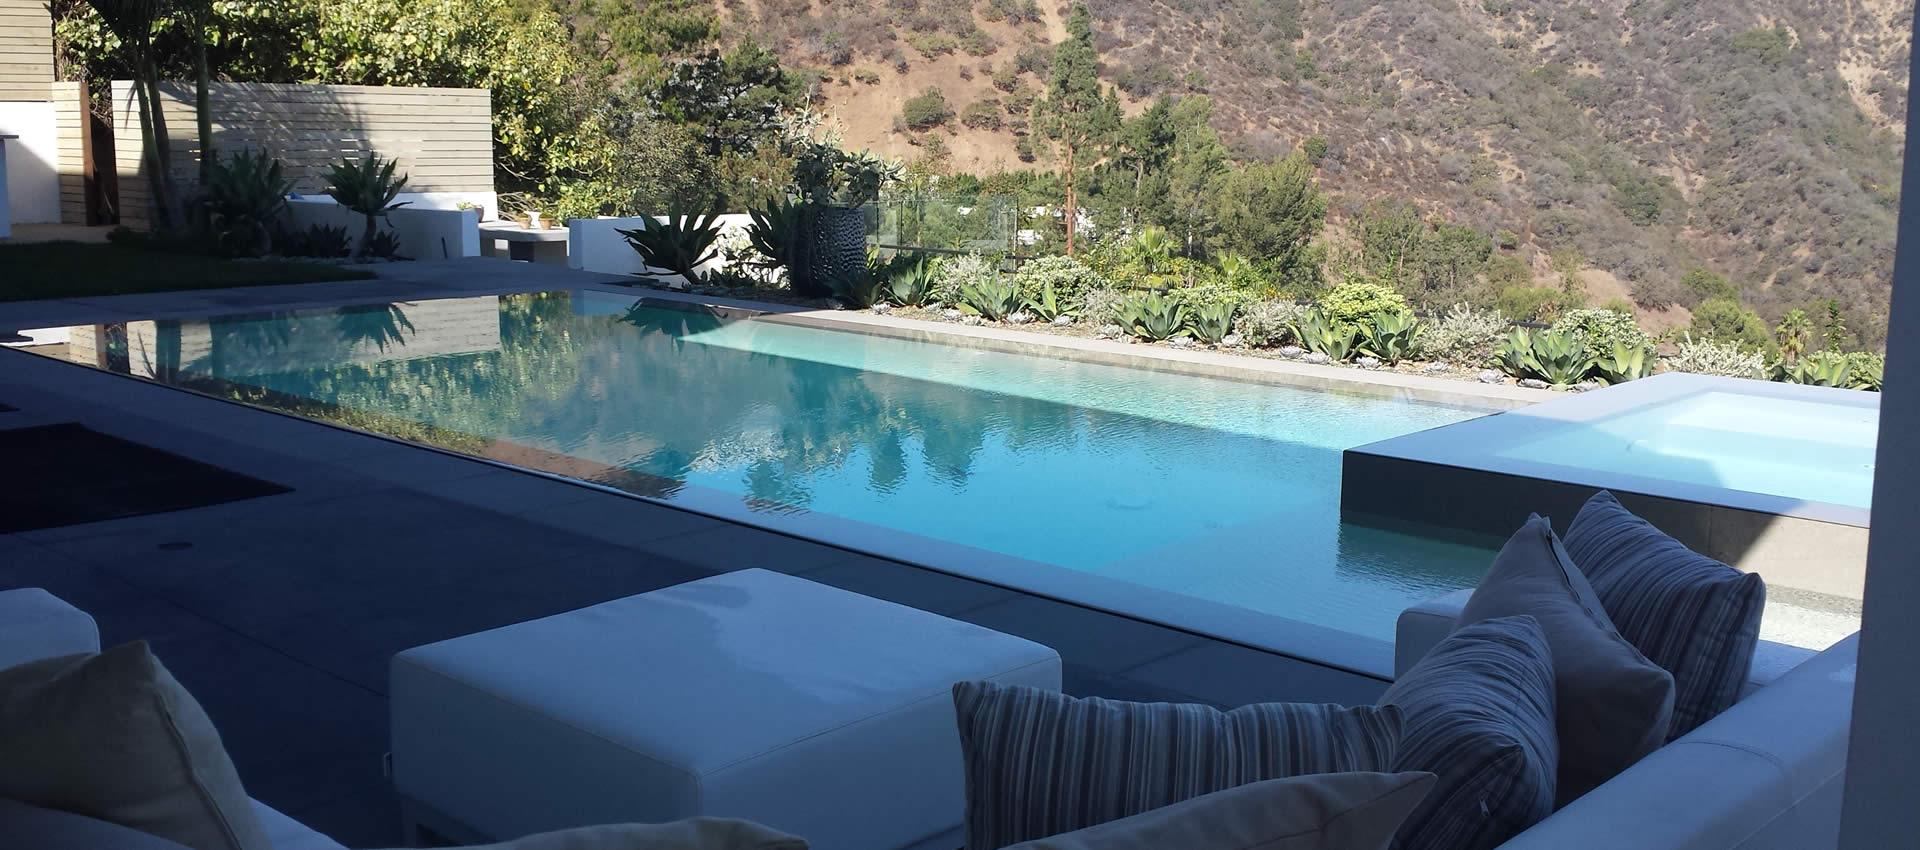 Los Angeles Pool Builders Southern California Swimming